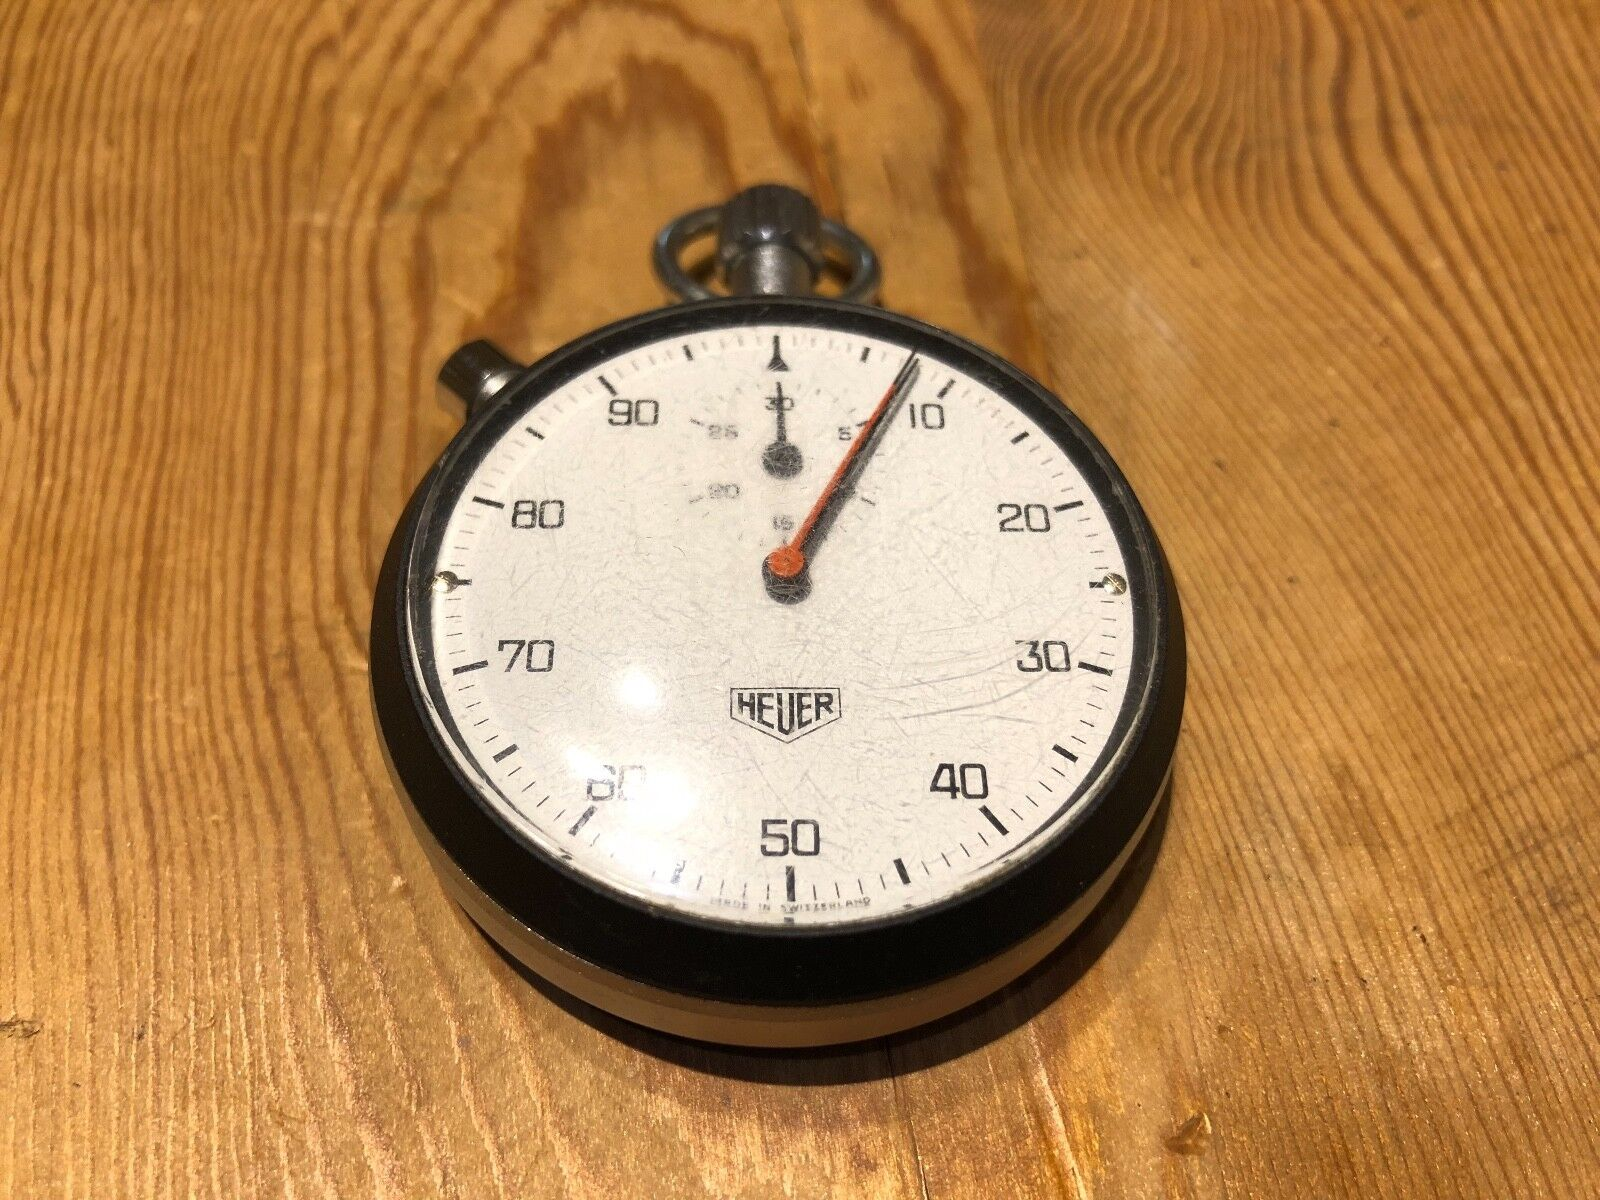 Very Rare - HEUER Sport Chrono Vintage - Vintage Chrono Stopwatch 53 mm diameter 3241af